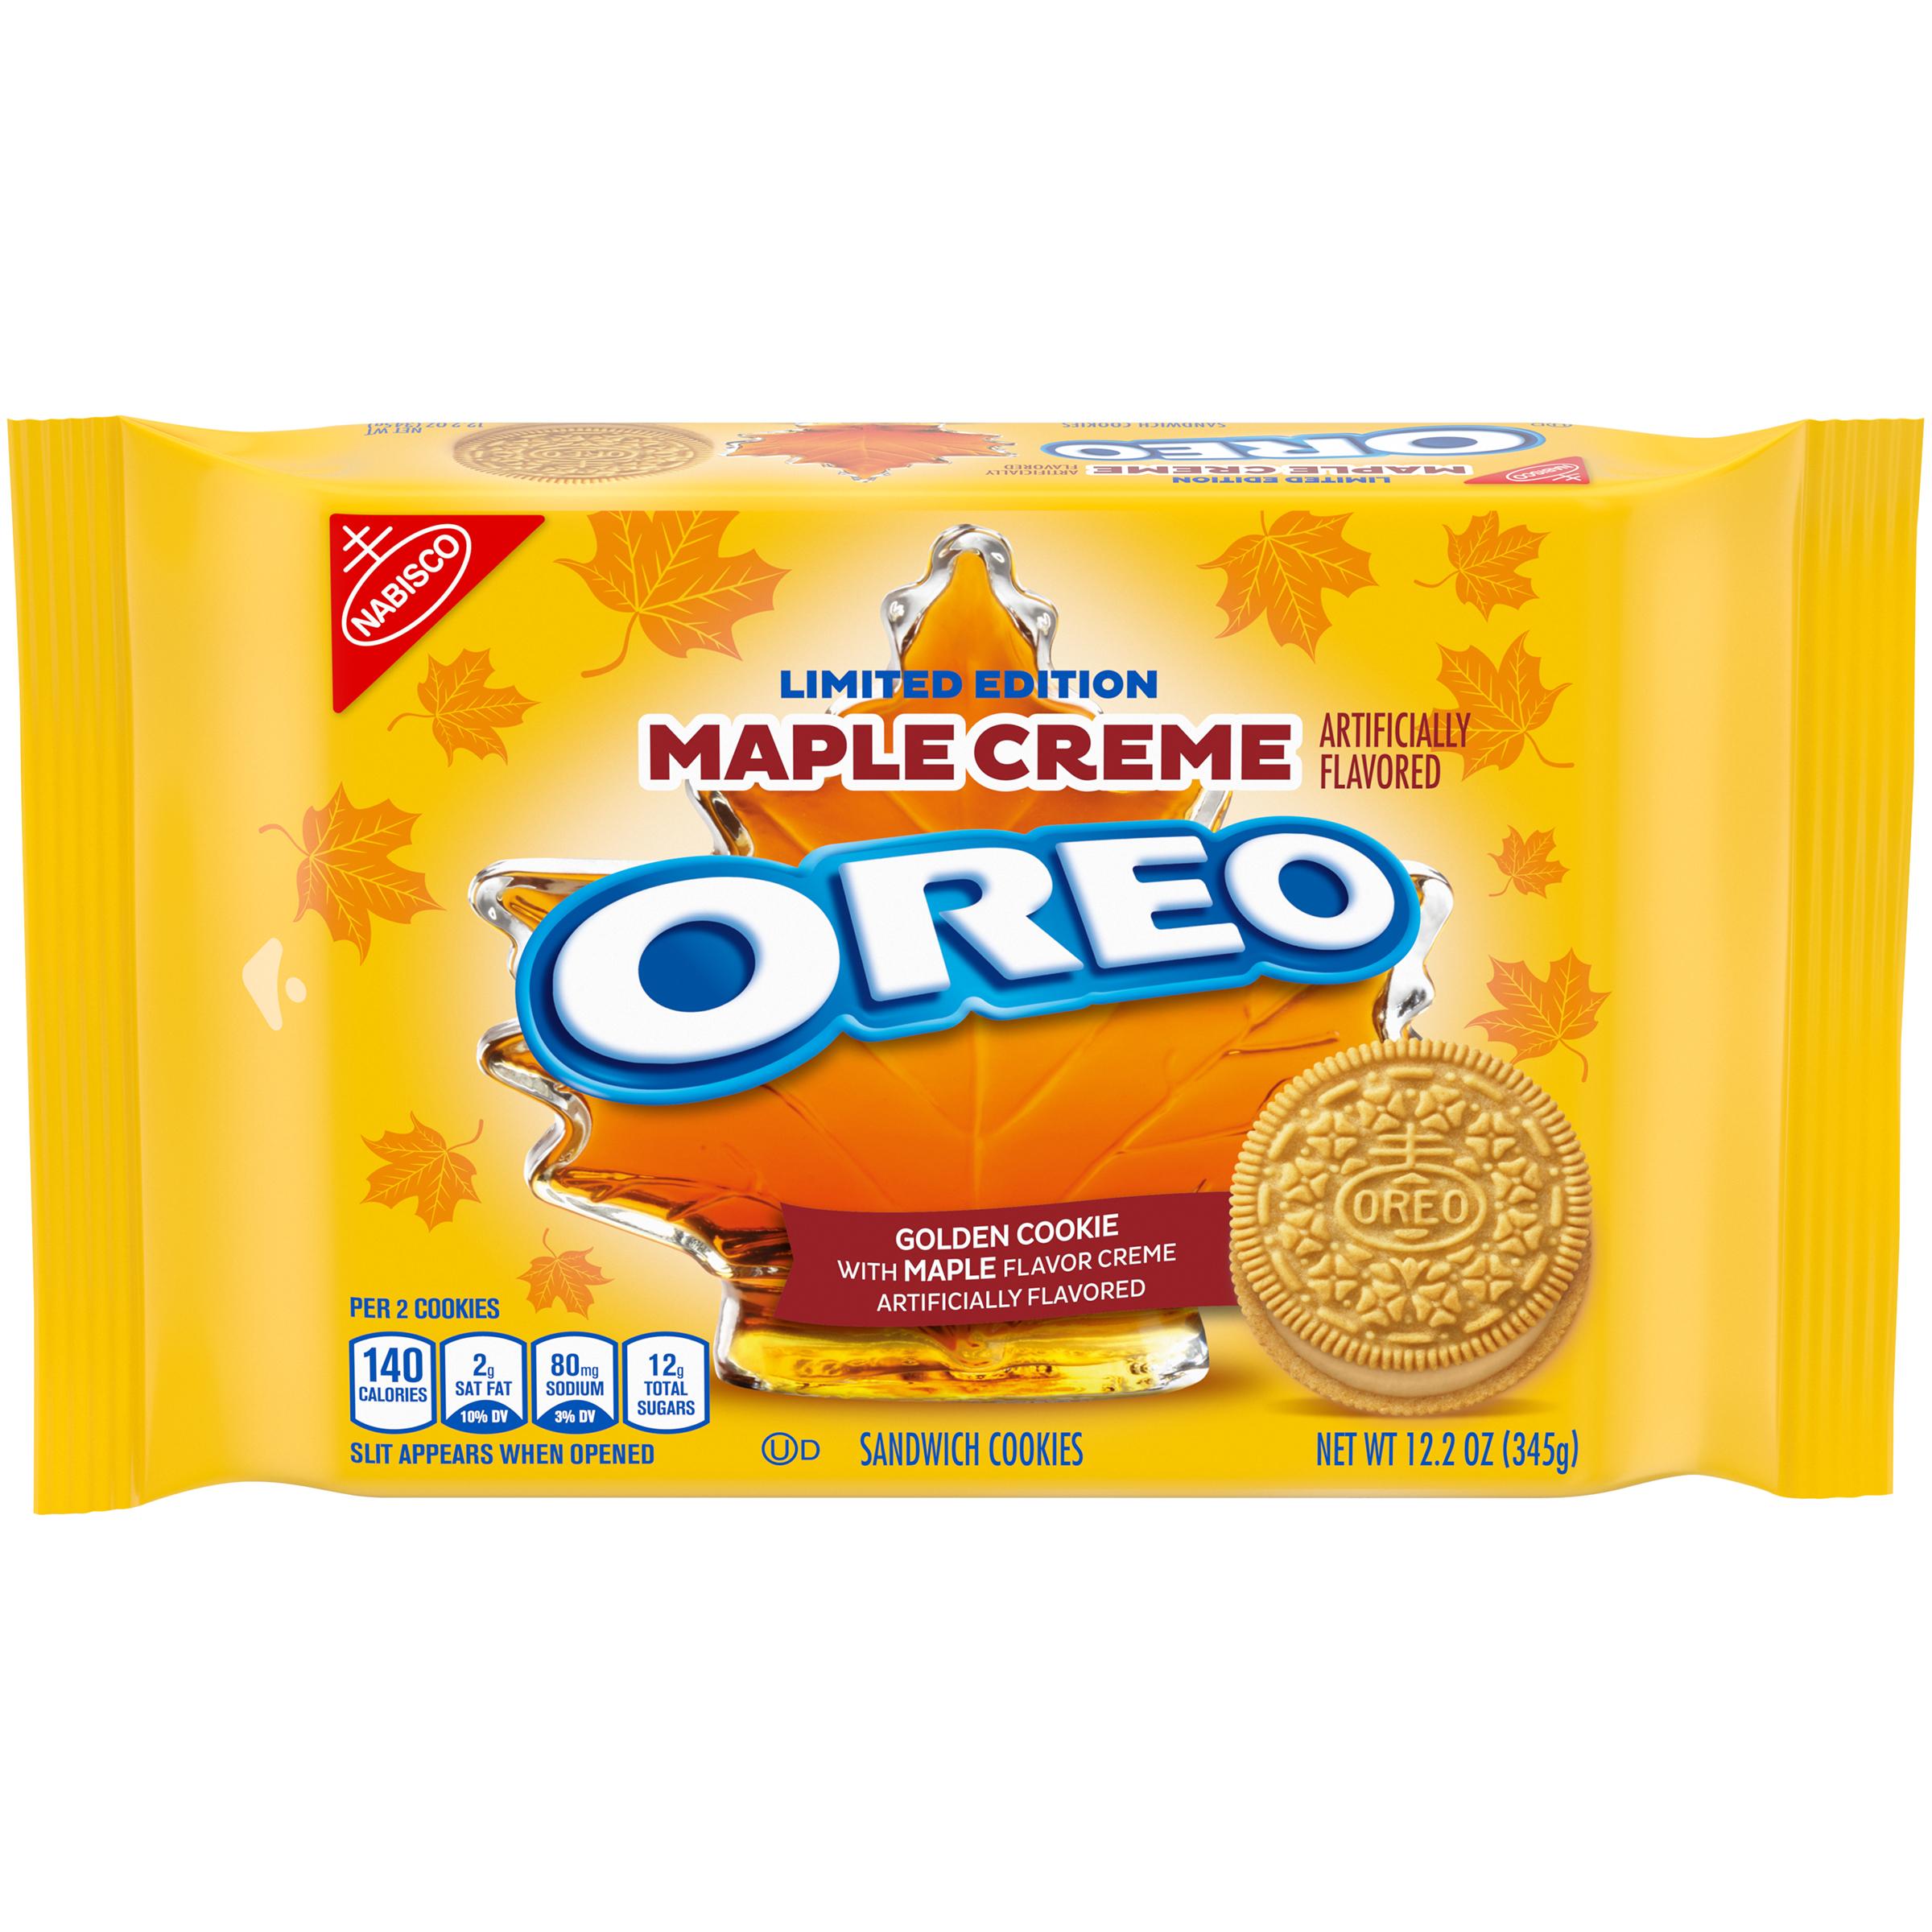 OREO Maple Creme Cookies 12.21 oz